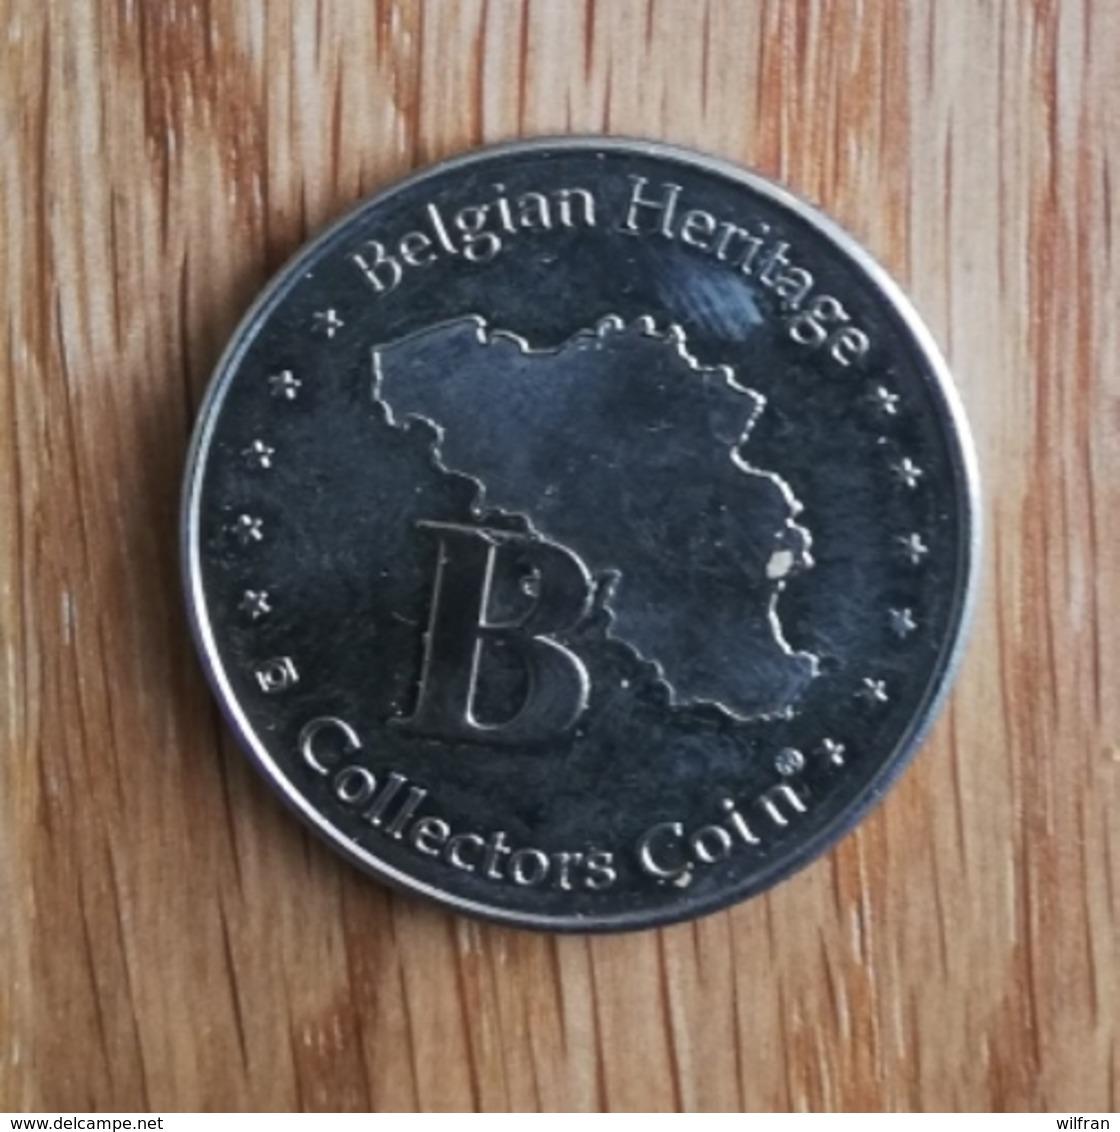 3244 Vz Citadelle Dinant - Kz Belgian Heritage Collectors Coin - België